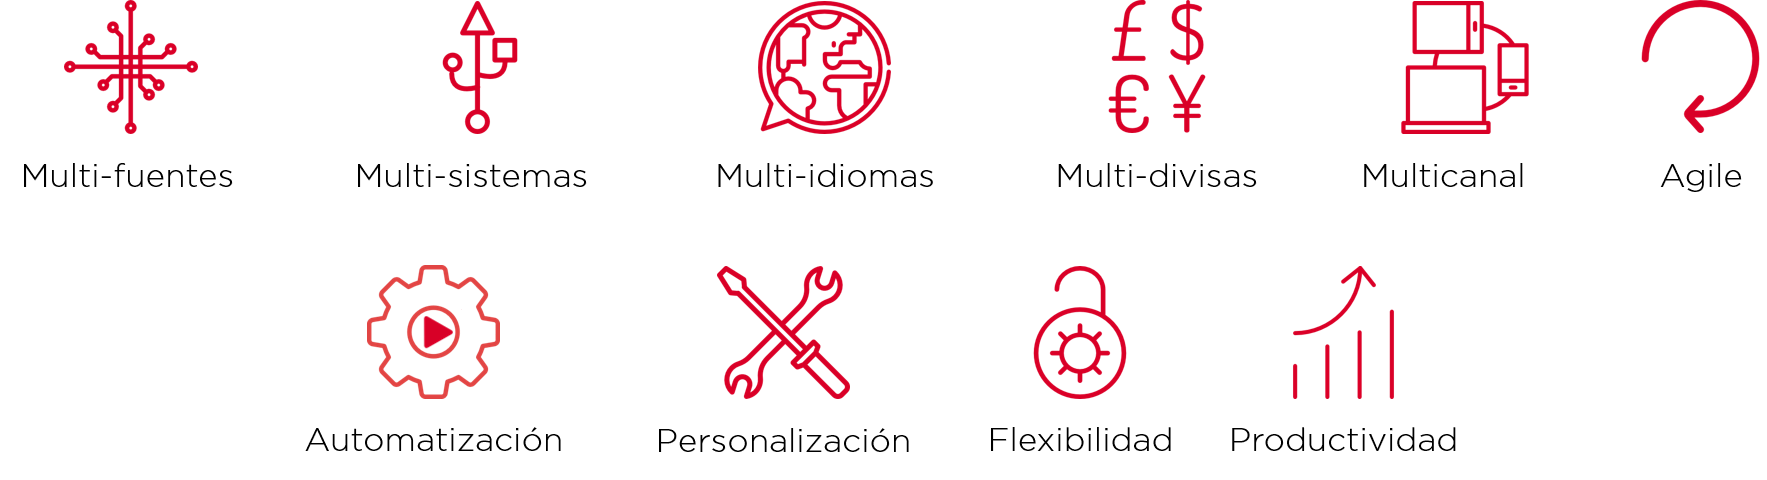 multi-fuentes, multi-idiomas, multi-divisas, multi-sistemas, multi-canal, agile, automatizacion, personalizacion, flexibilidad, productividad